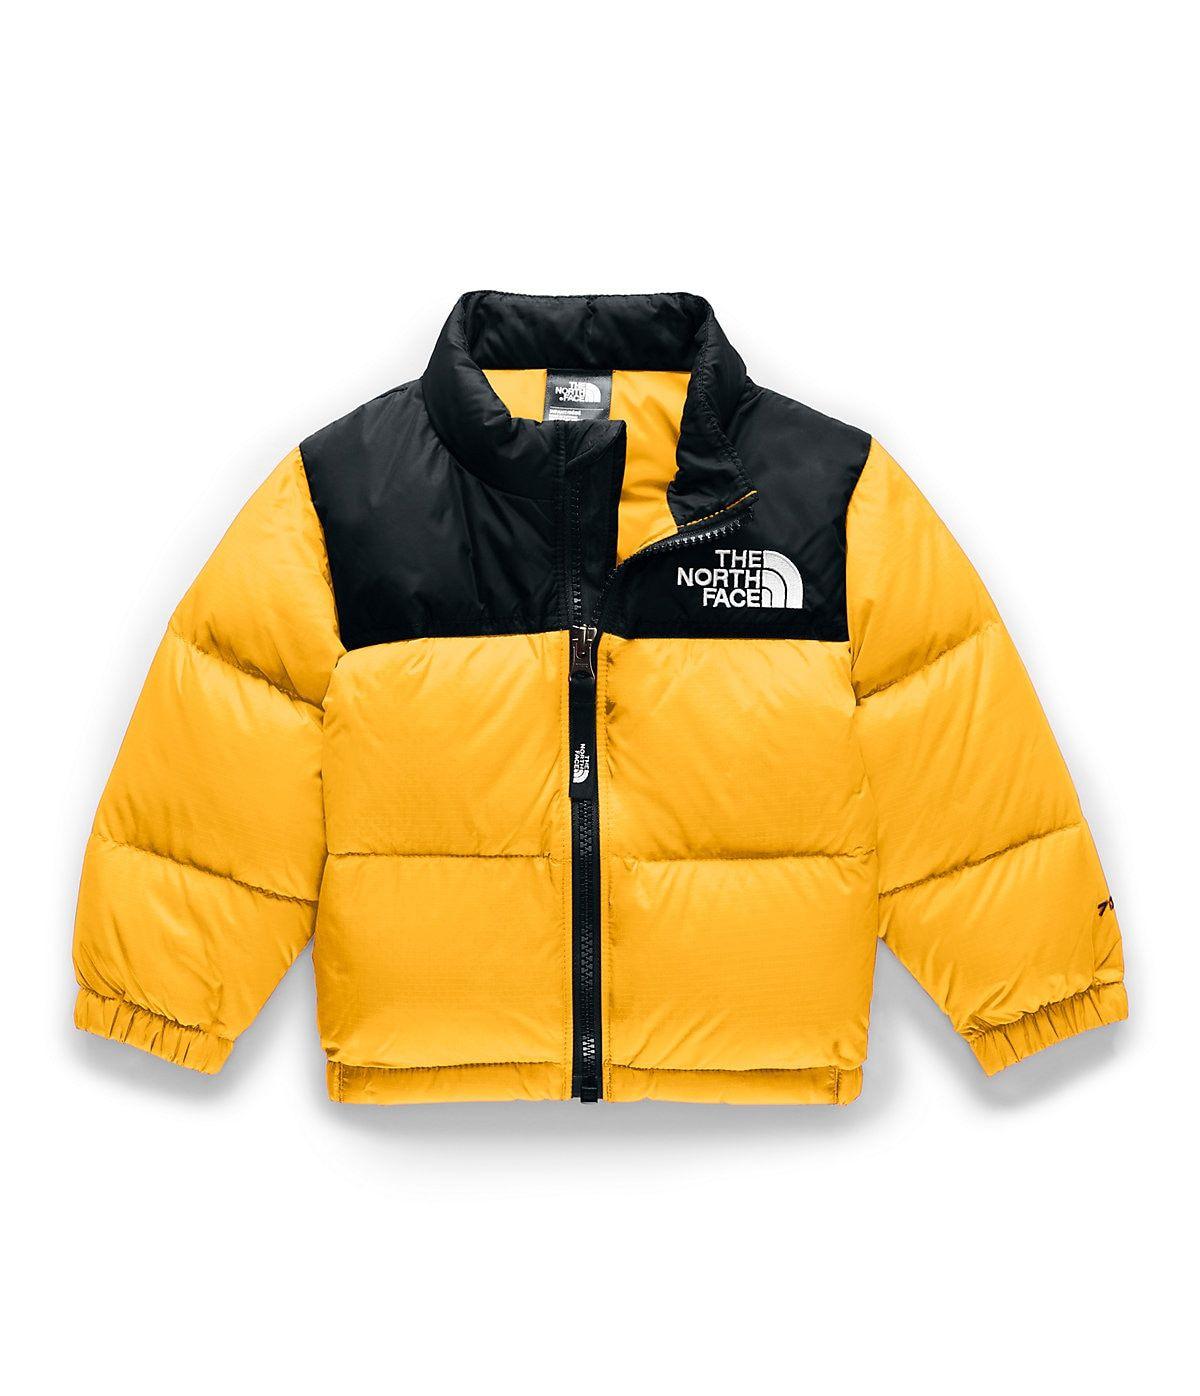 Infant 1996 Retro Nuptse Down Jacket The North Face In 2021 North Face Bomber Jacket North Face Puffer Jacket Down Jacket [ 1396 x 1200 Pixel ]